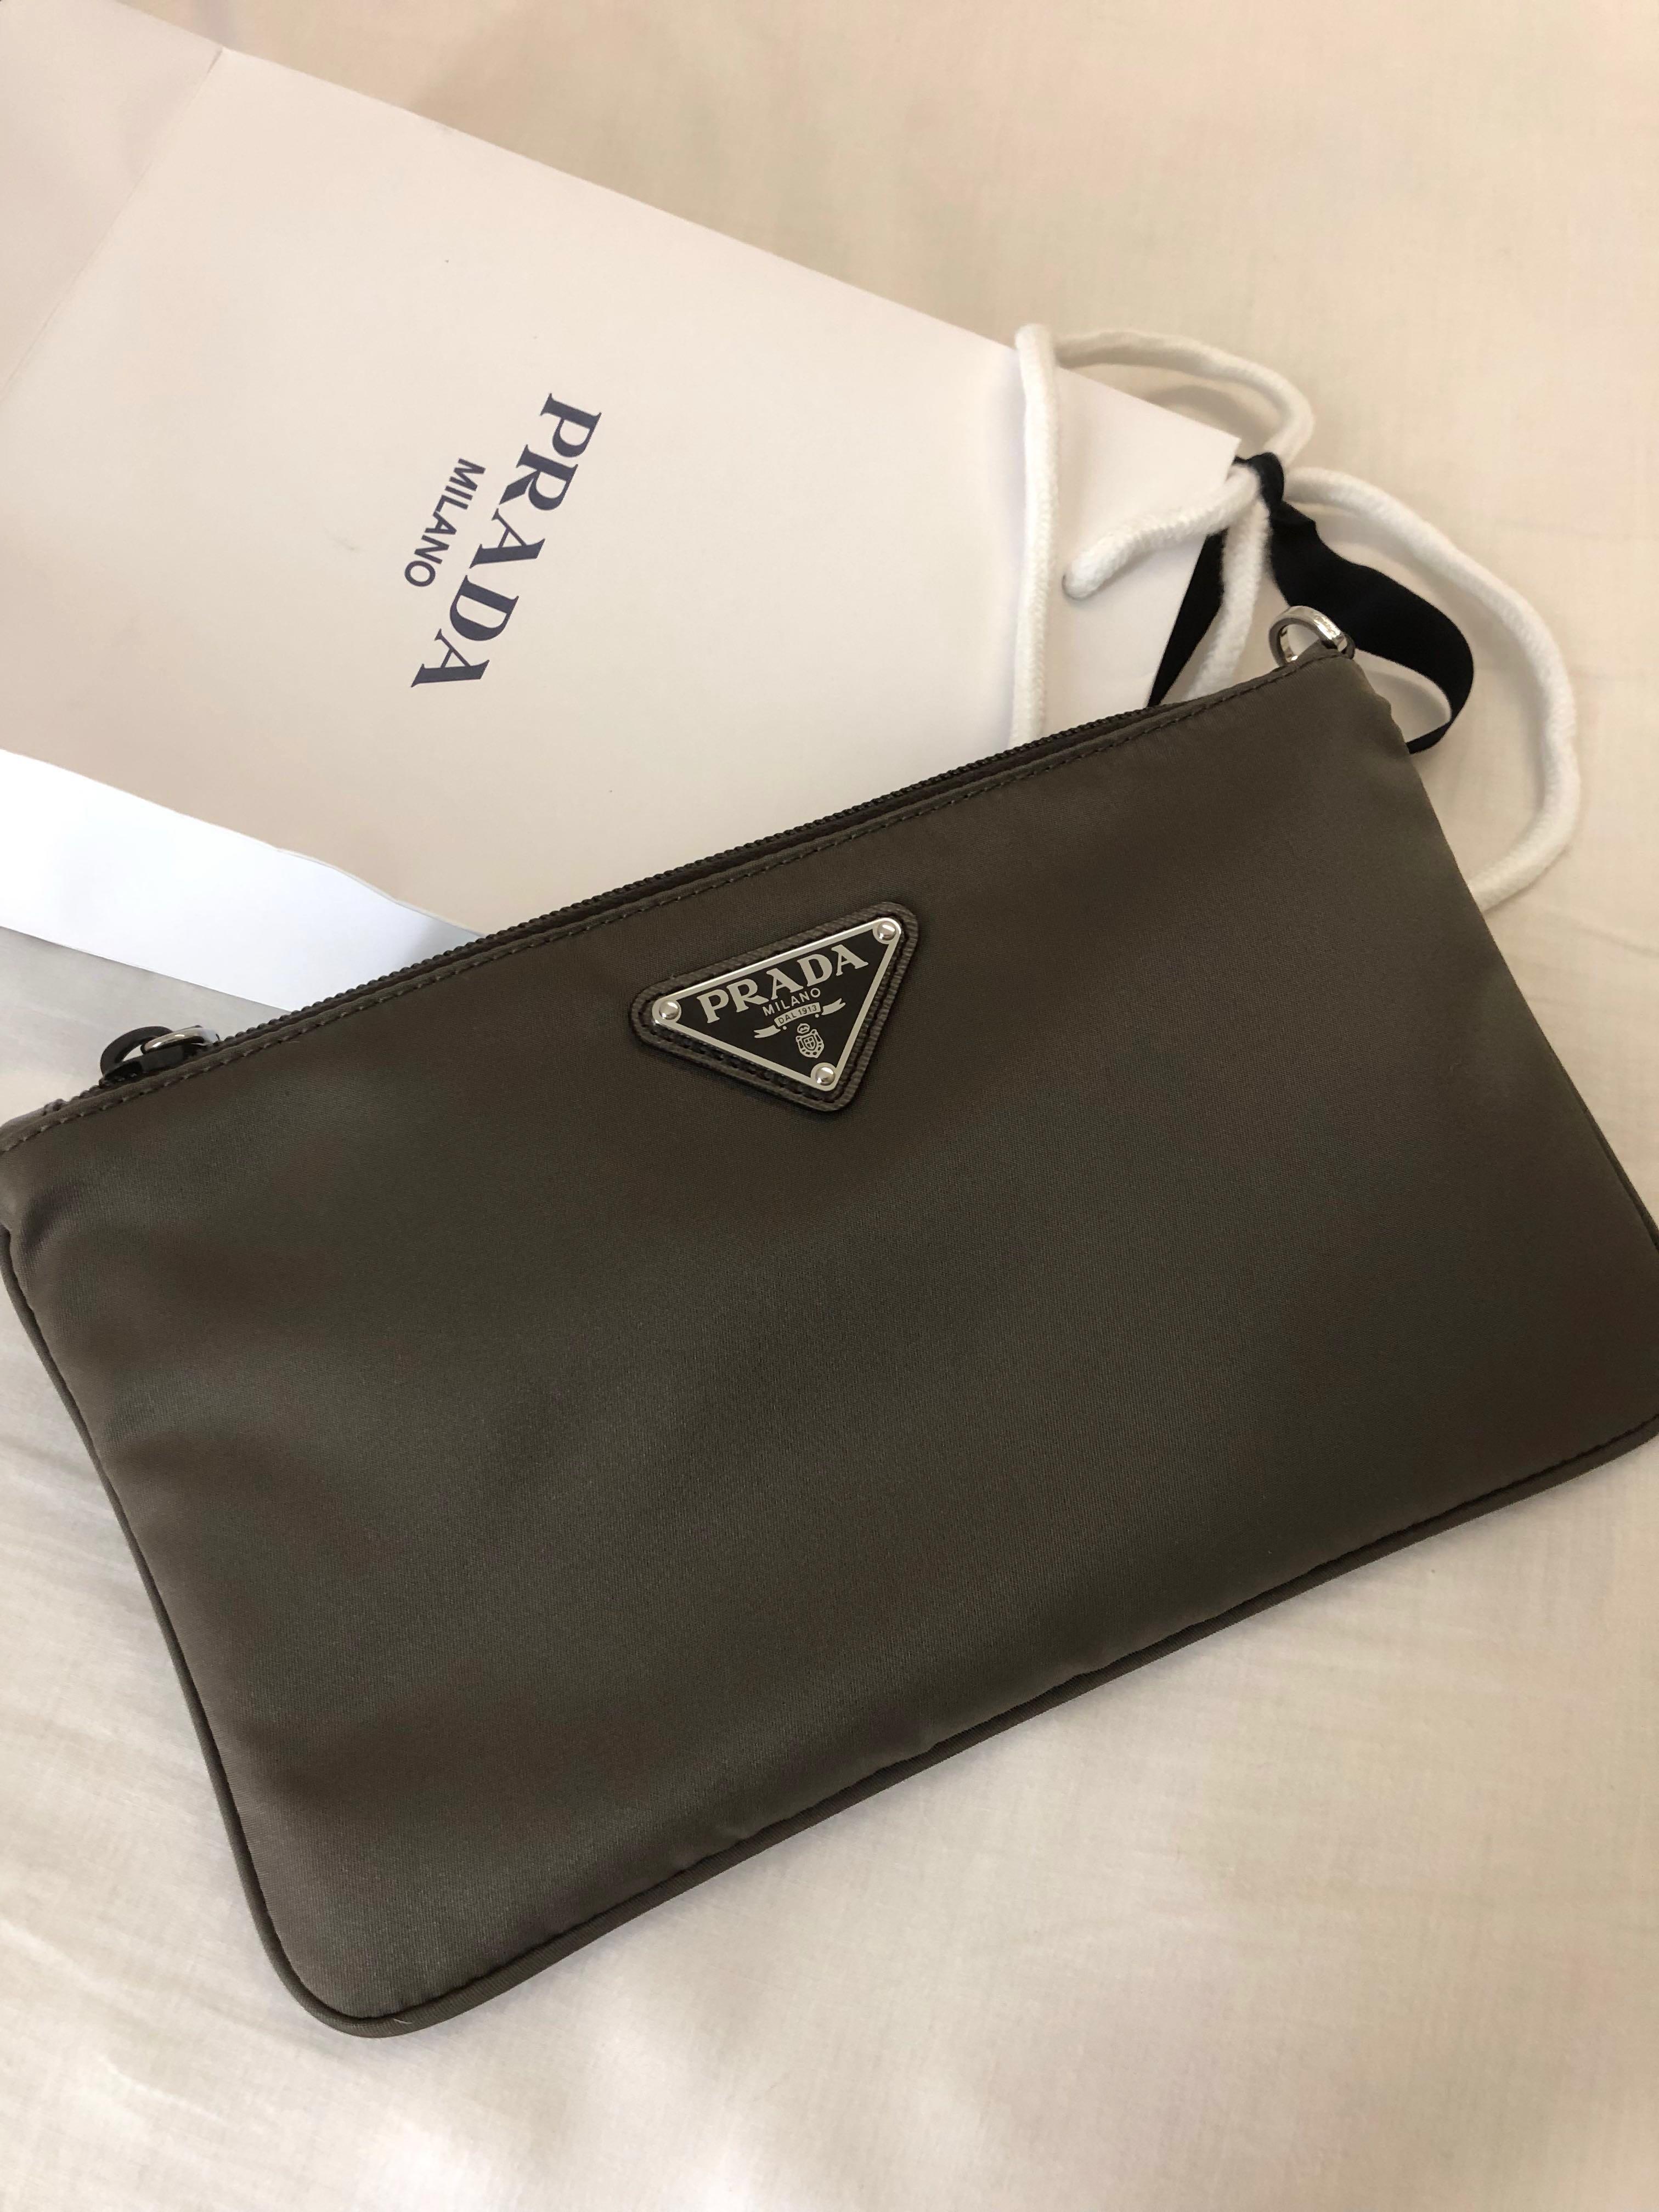 770c6c75c859 Prada Nylon Clutch, Luxury, Bags & Wallets, Clutches on Carousell